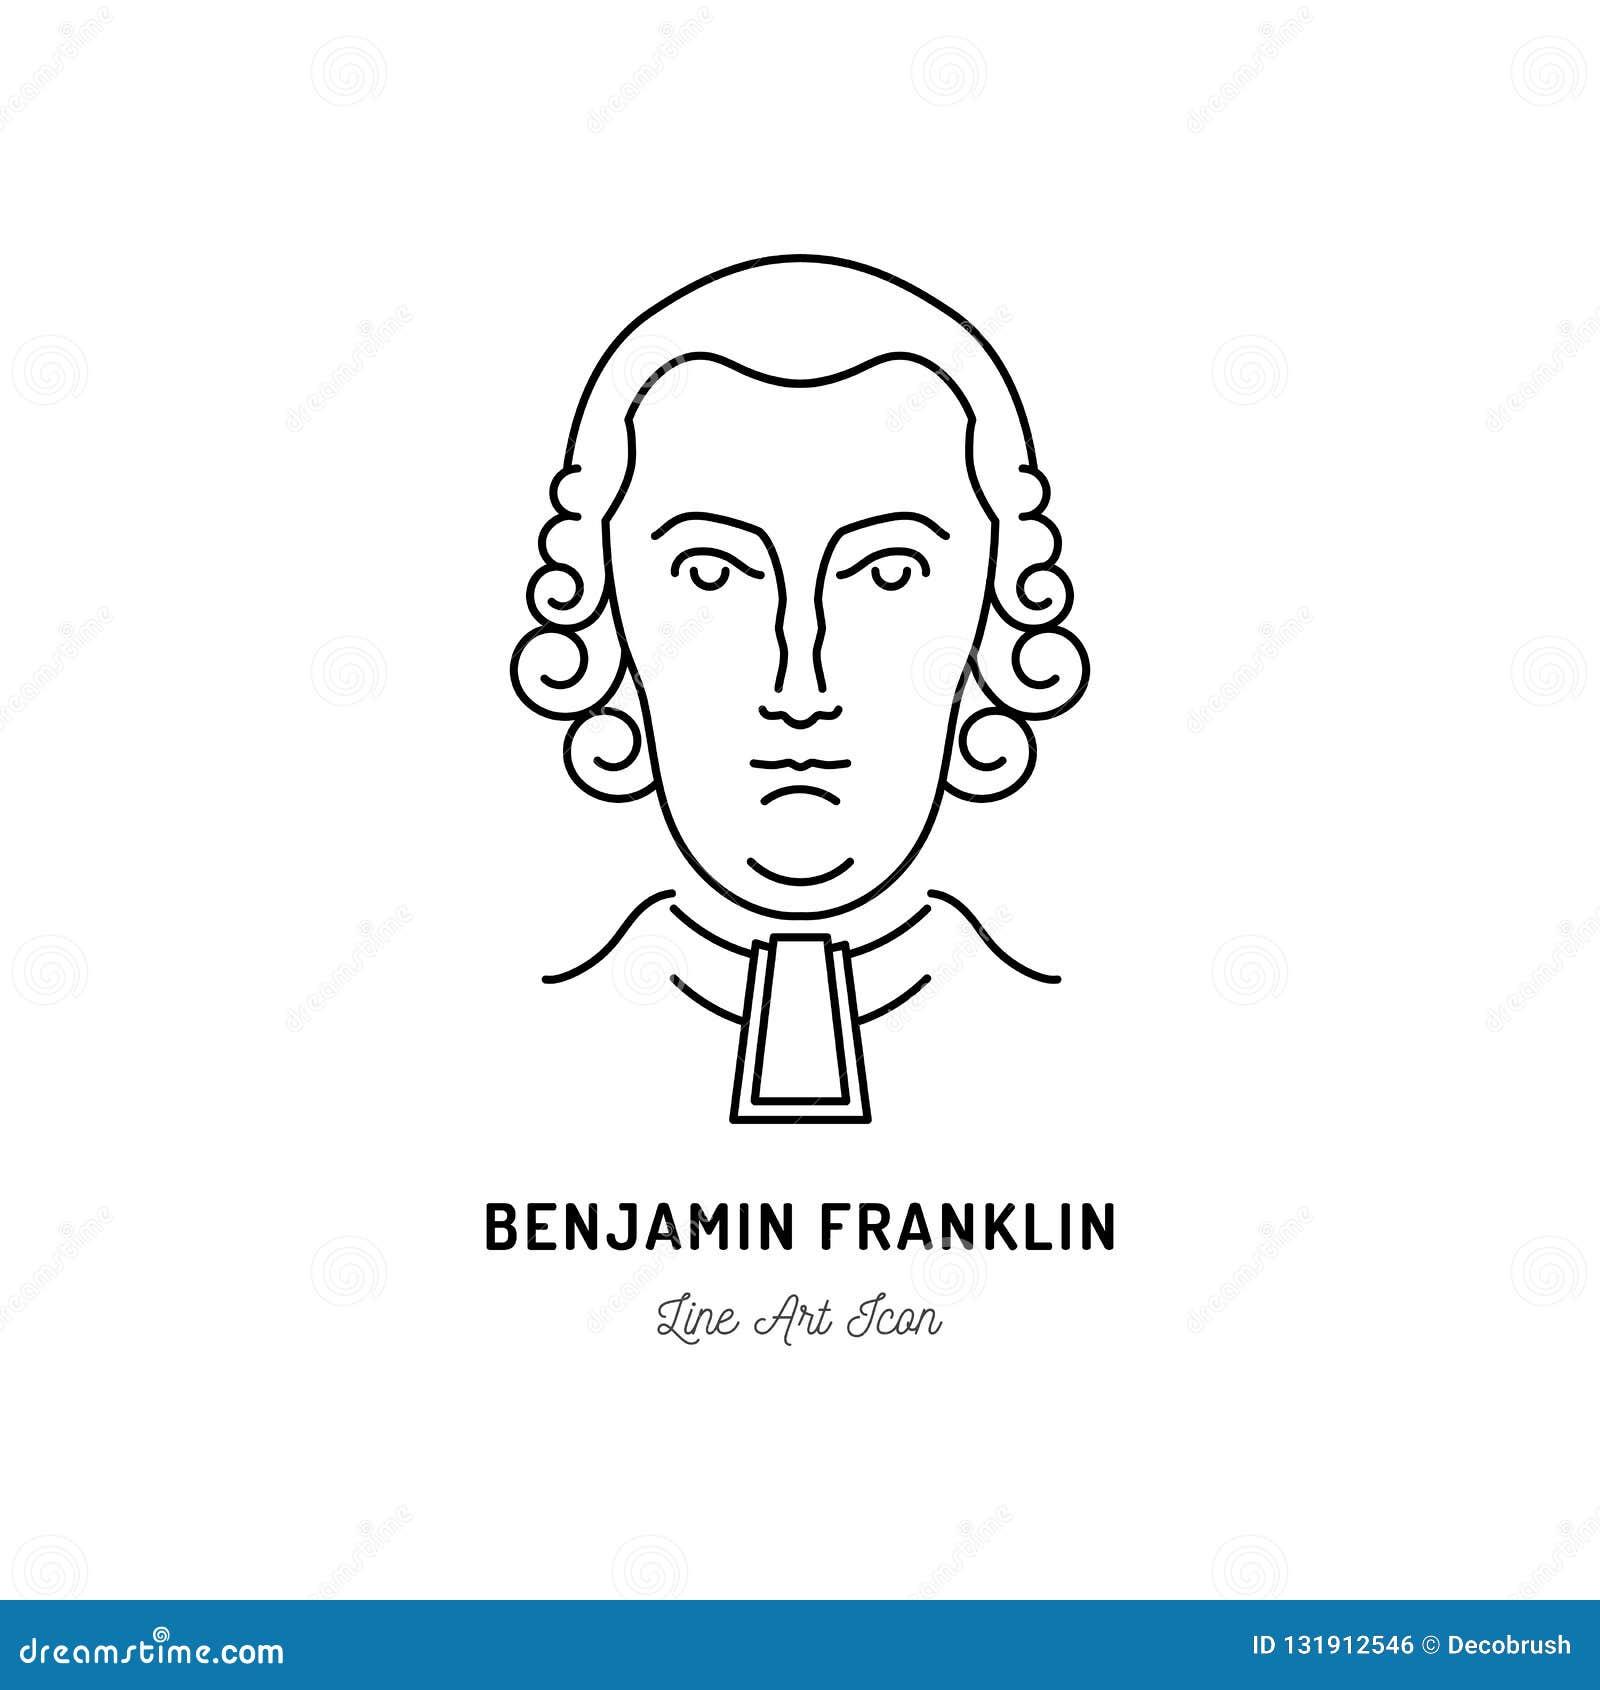 Benjamin Franklin Icon USA politician. Line art icon, Vector illustration